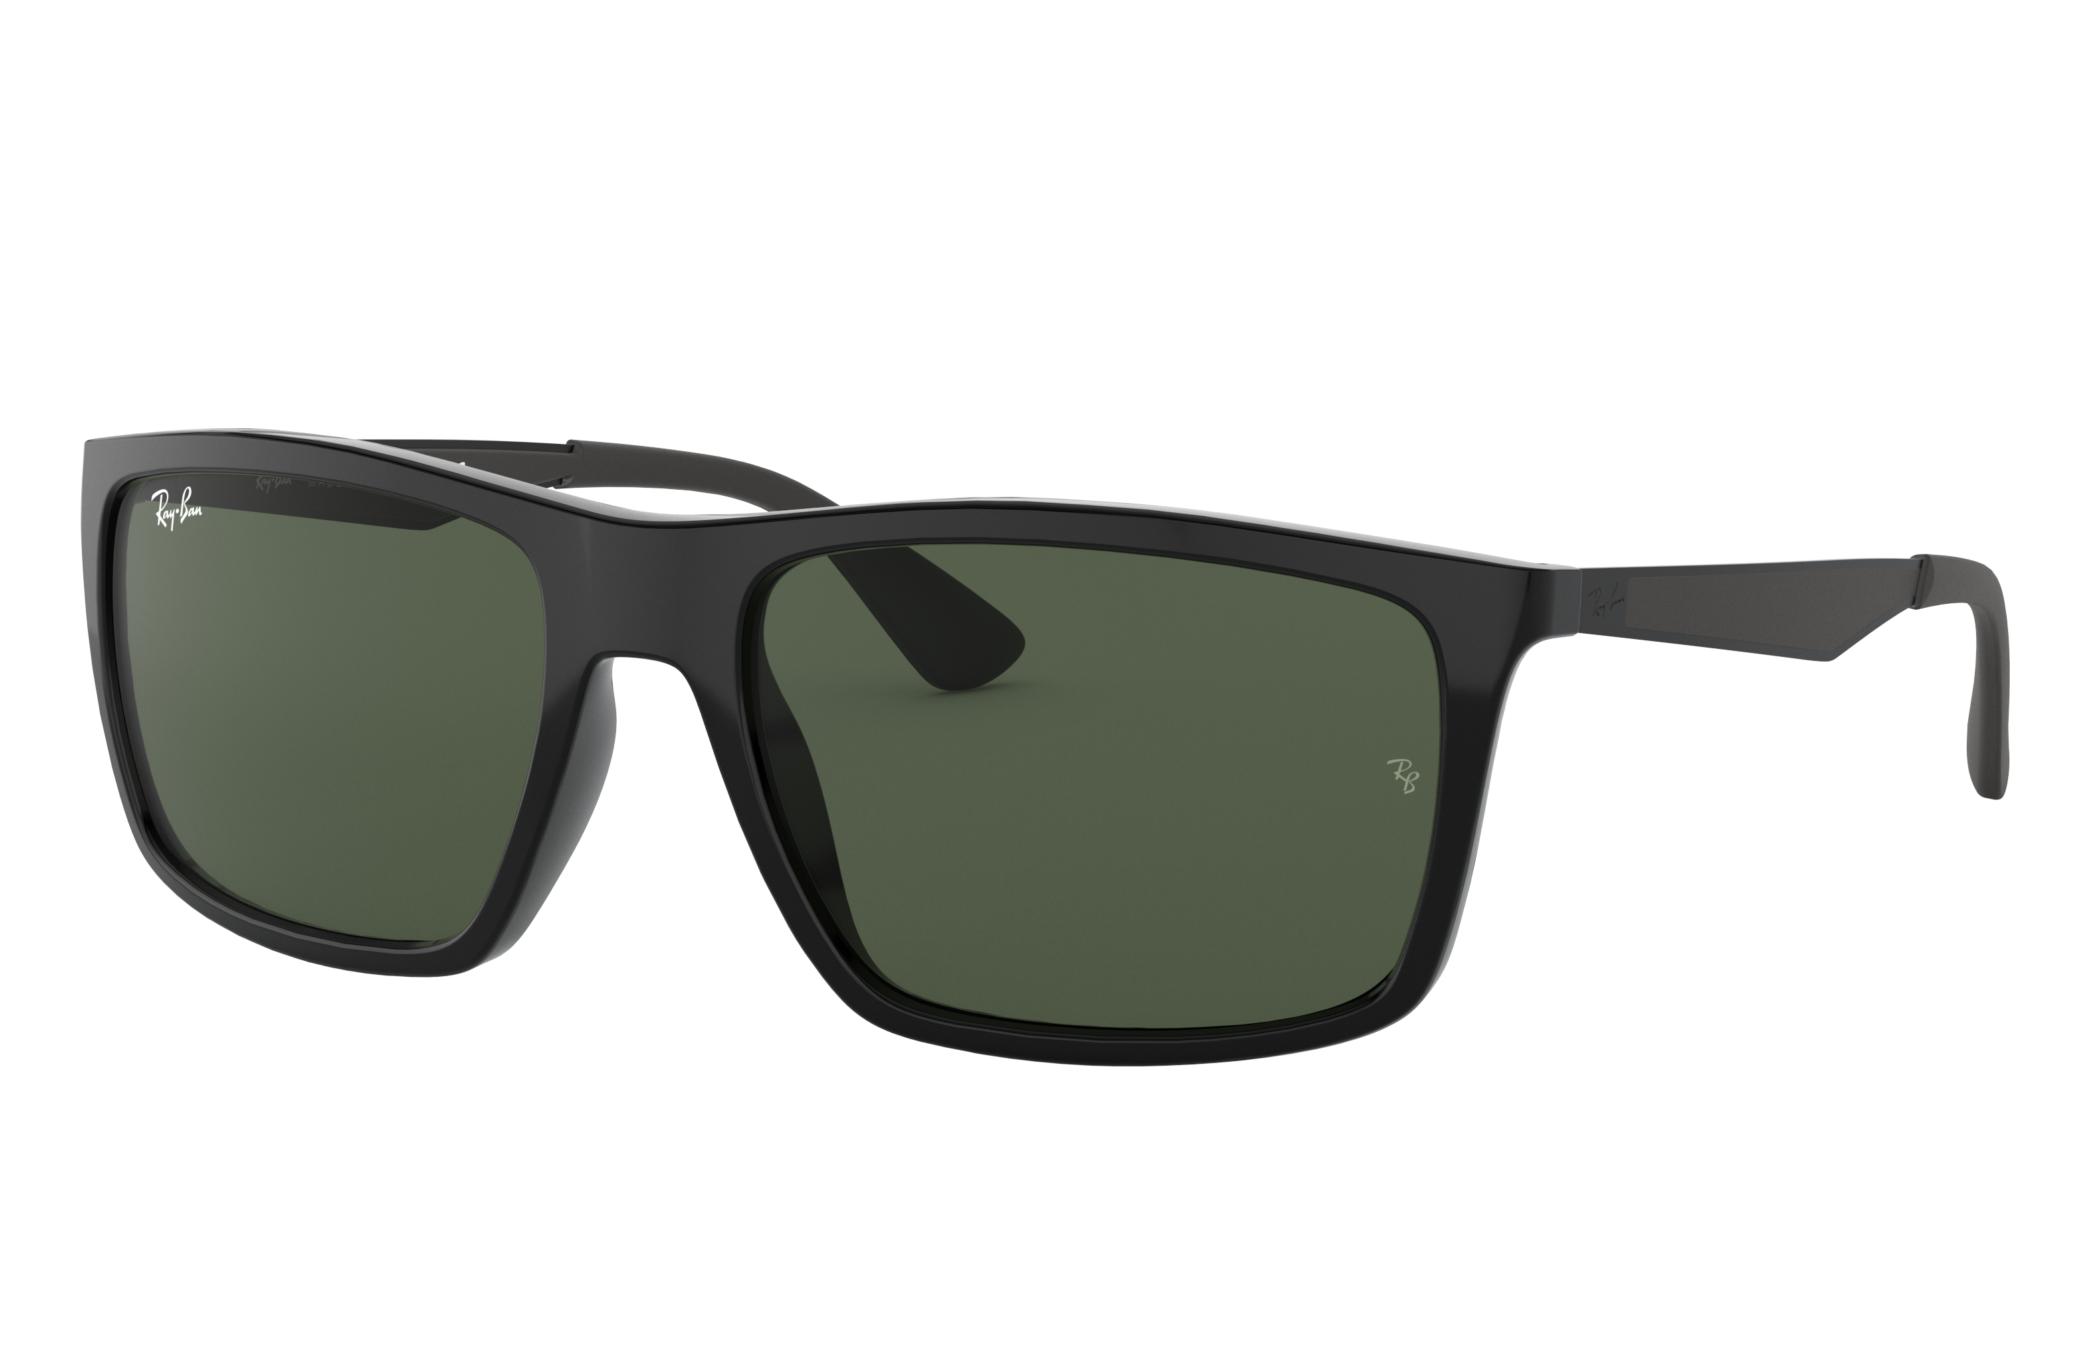 Ray-Ban Rb4228 Black, Green Lenses - RB4228